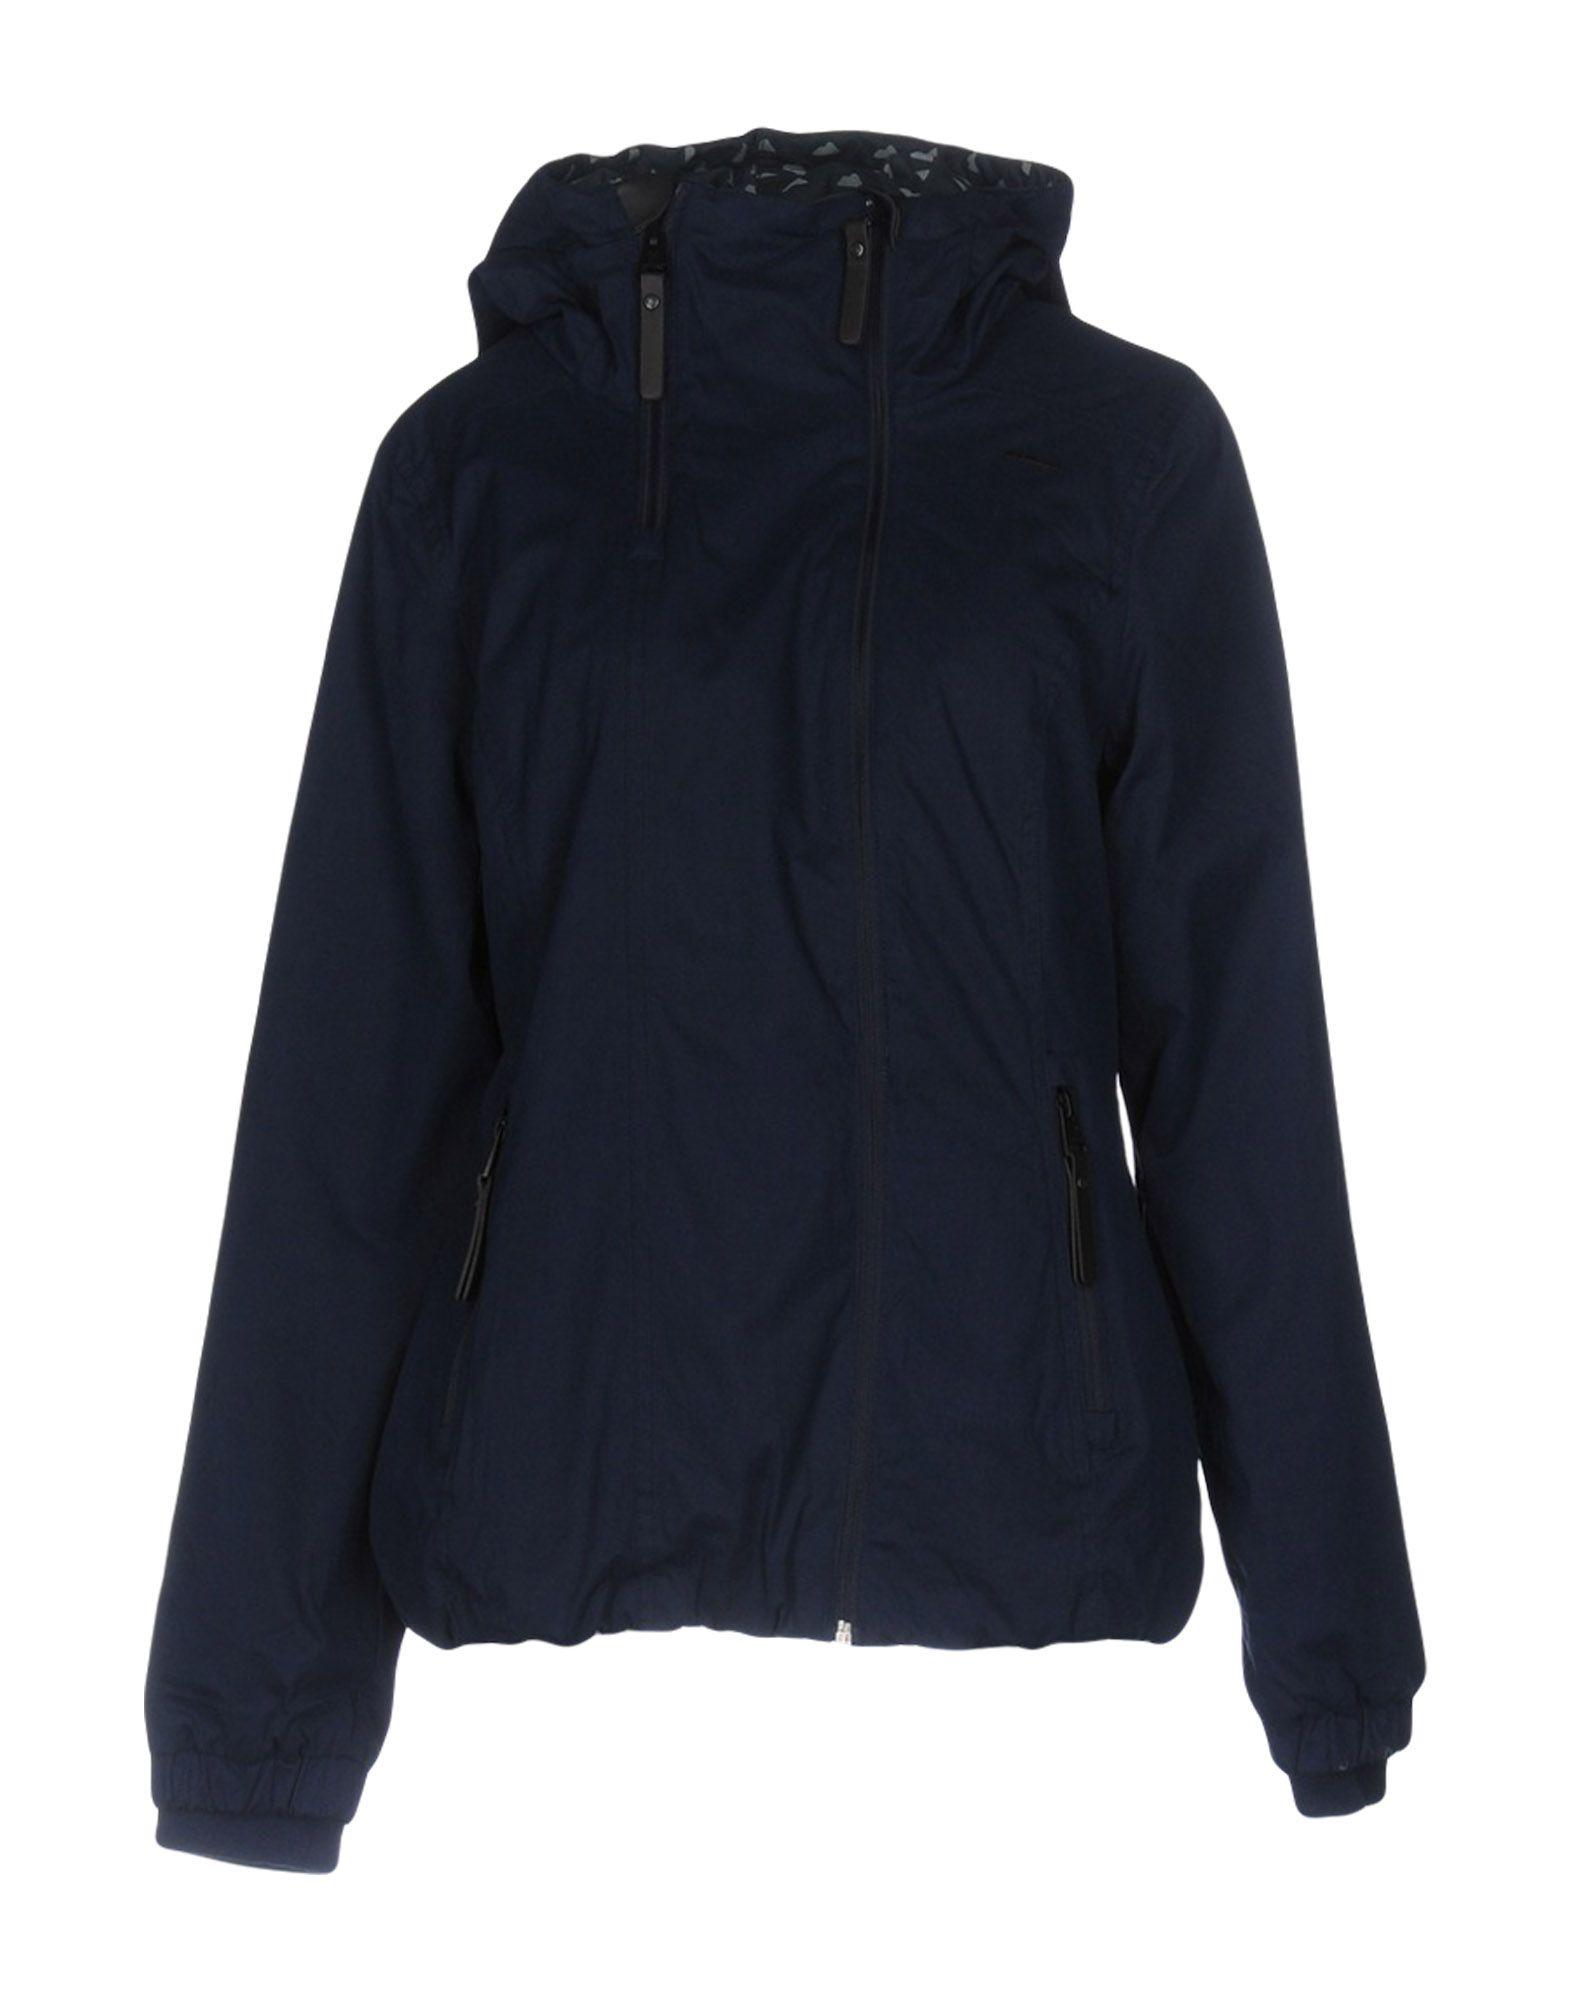 RAGWEAR Damen Jacke Farbe Dunkelblau Größe 6